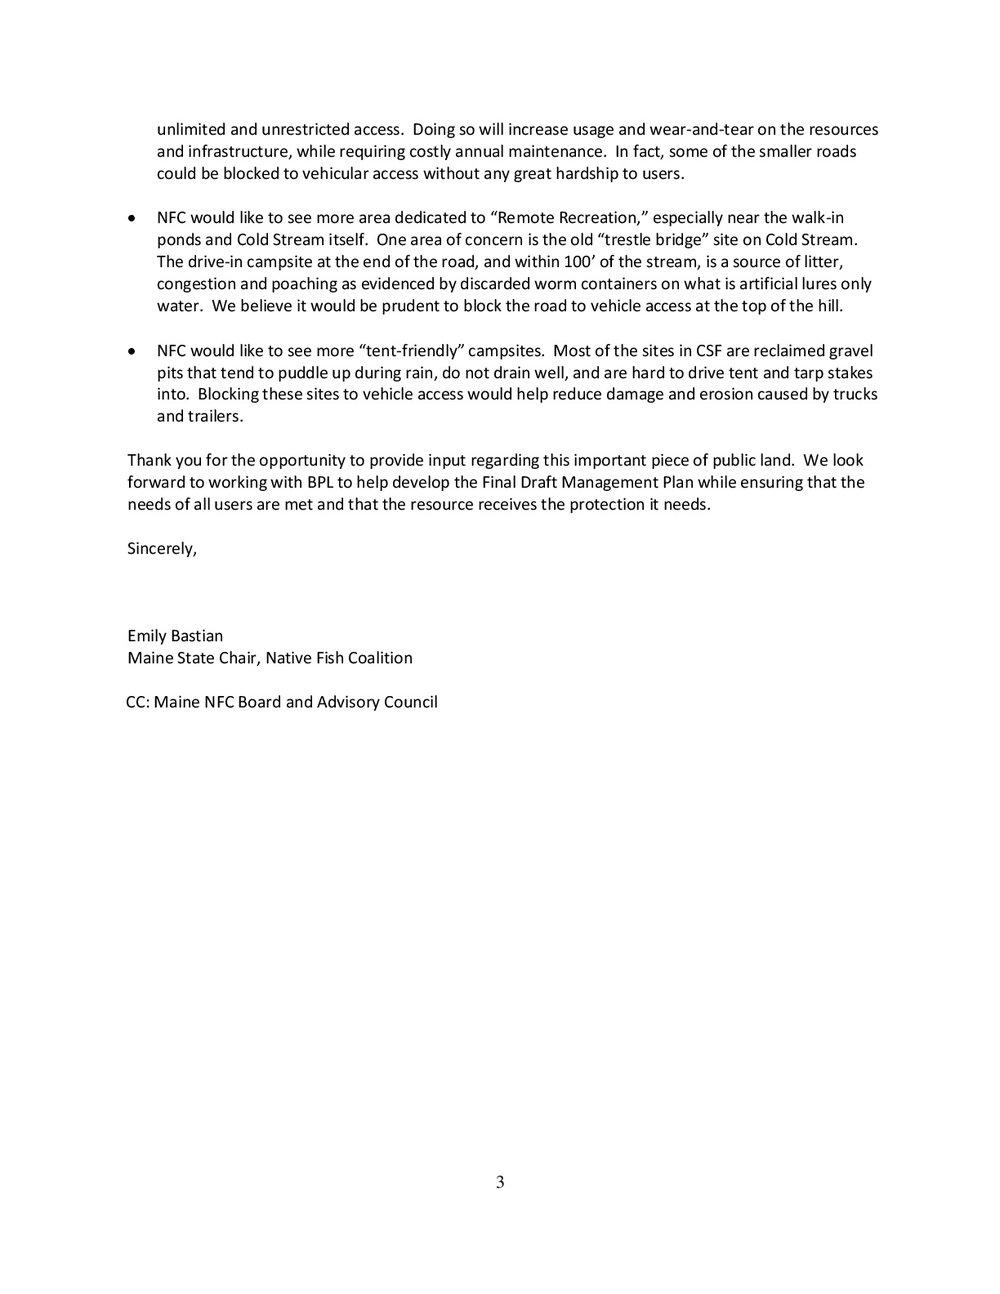 Upper-Kennebec-Management-Plan-8-8-18---NFC-Comments-003.jpg